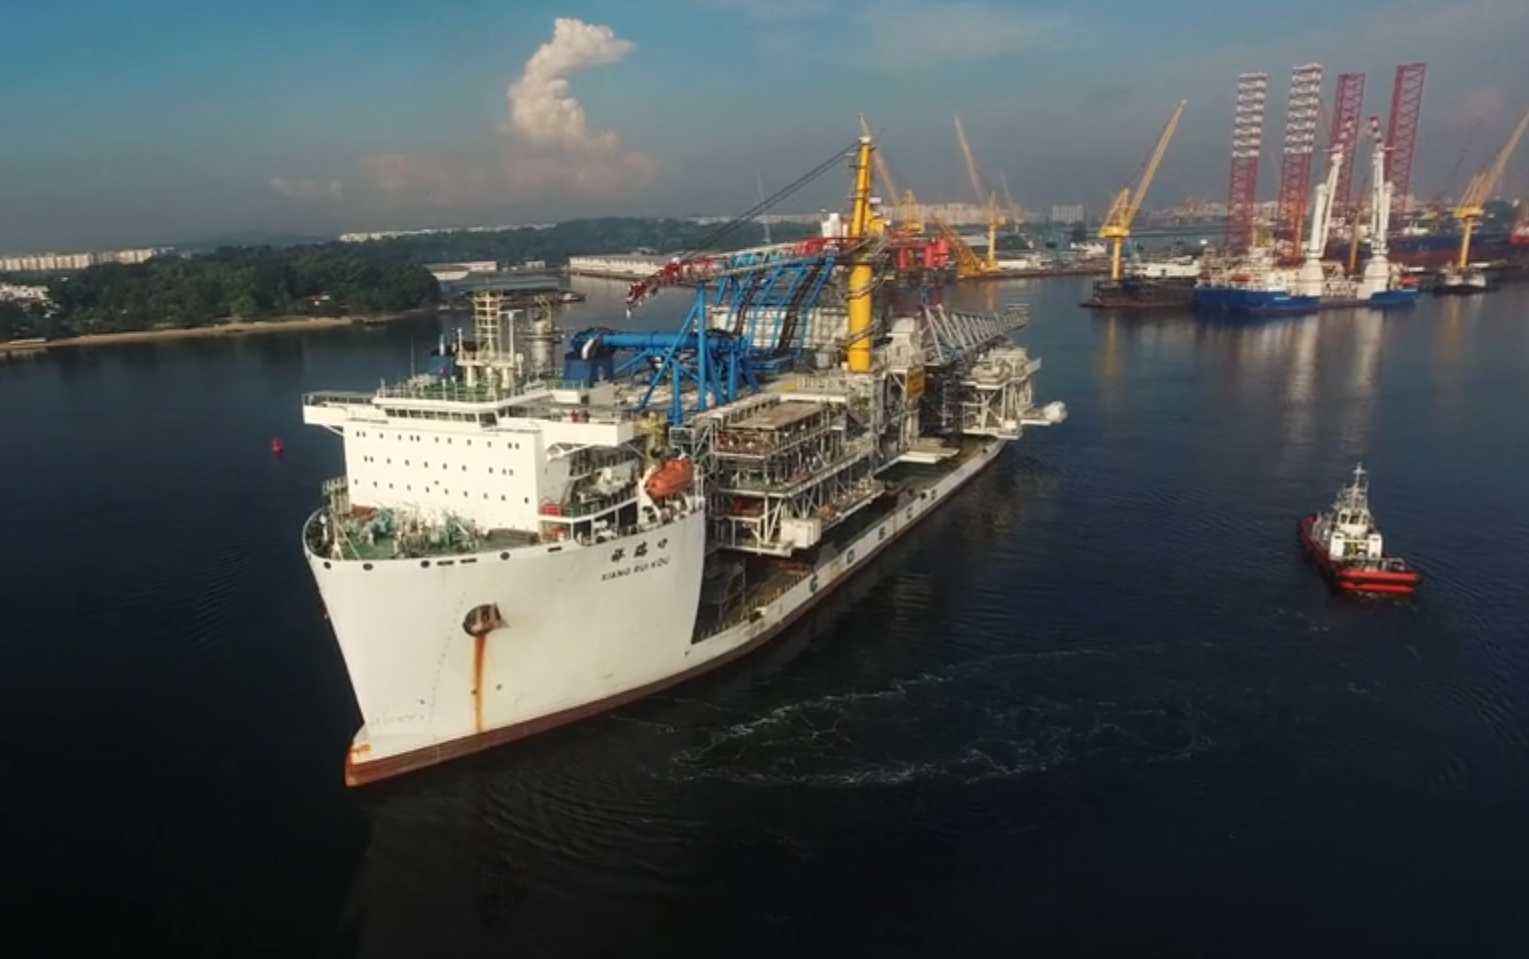 Ivar Aasen platform deck is on its way to Norway